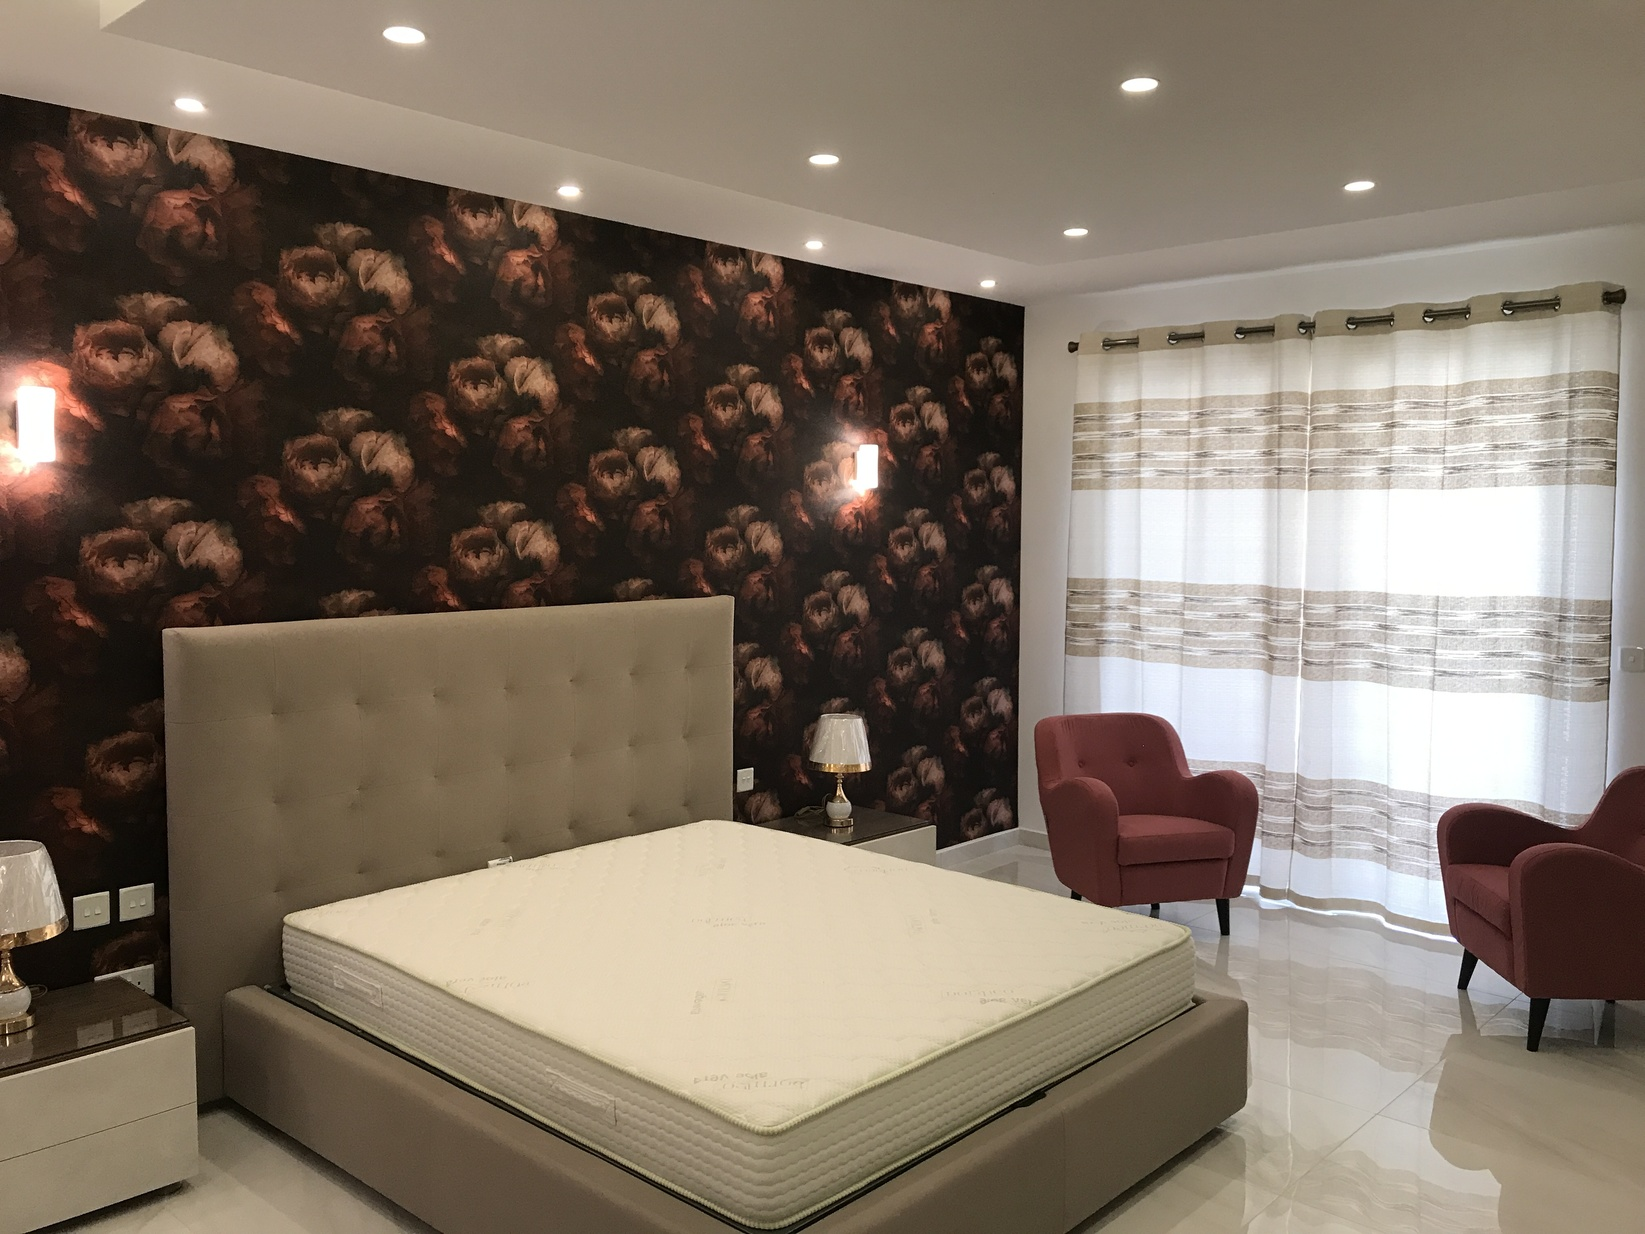 3 bed Apartment For Rent in Qawra, Qawra - thumb 17